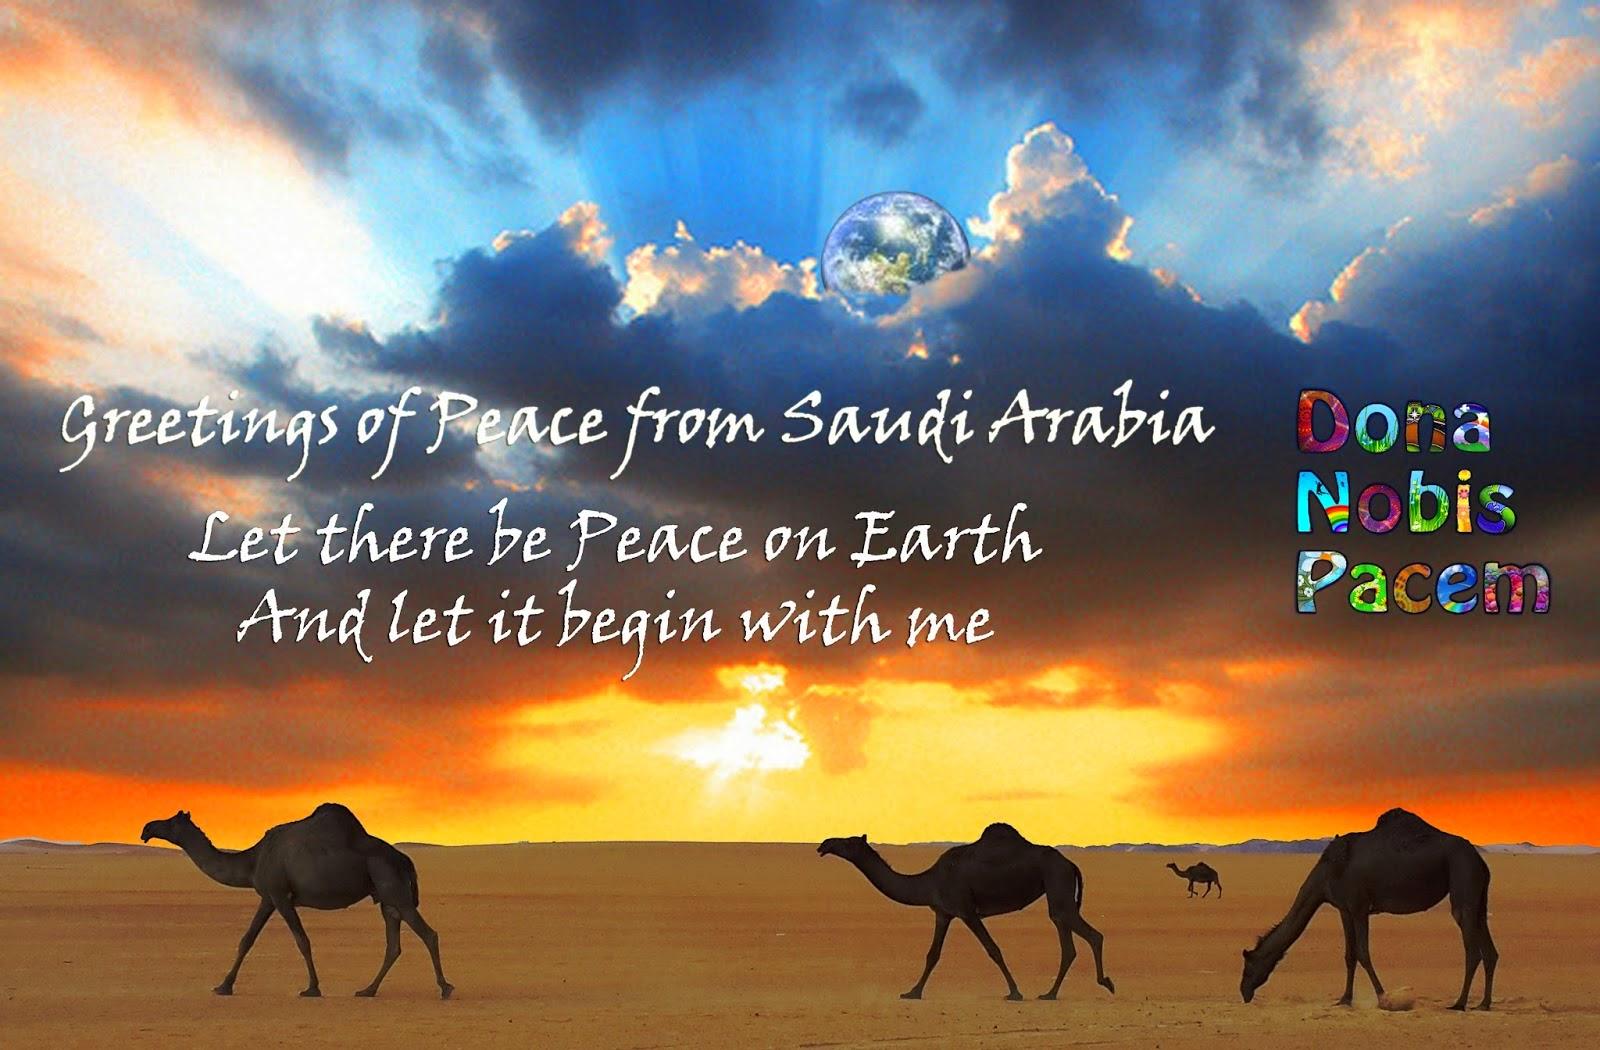 http://susiesbigadventure.blogspot.com/2014/11/dona-nobis-pacem-blogging-for-peace-in.html